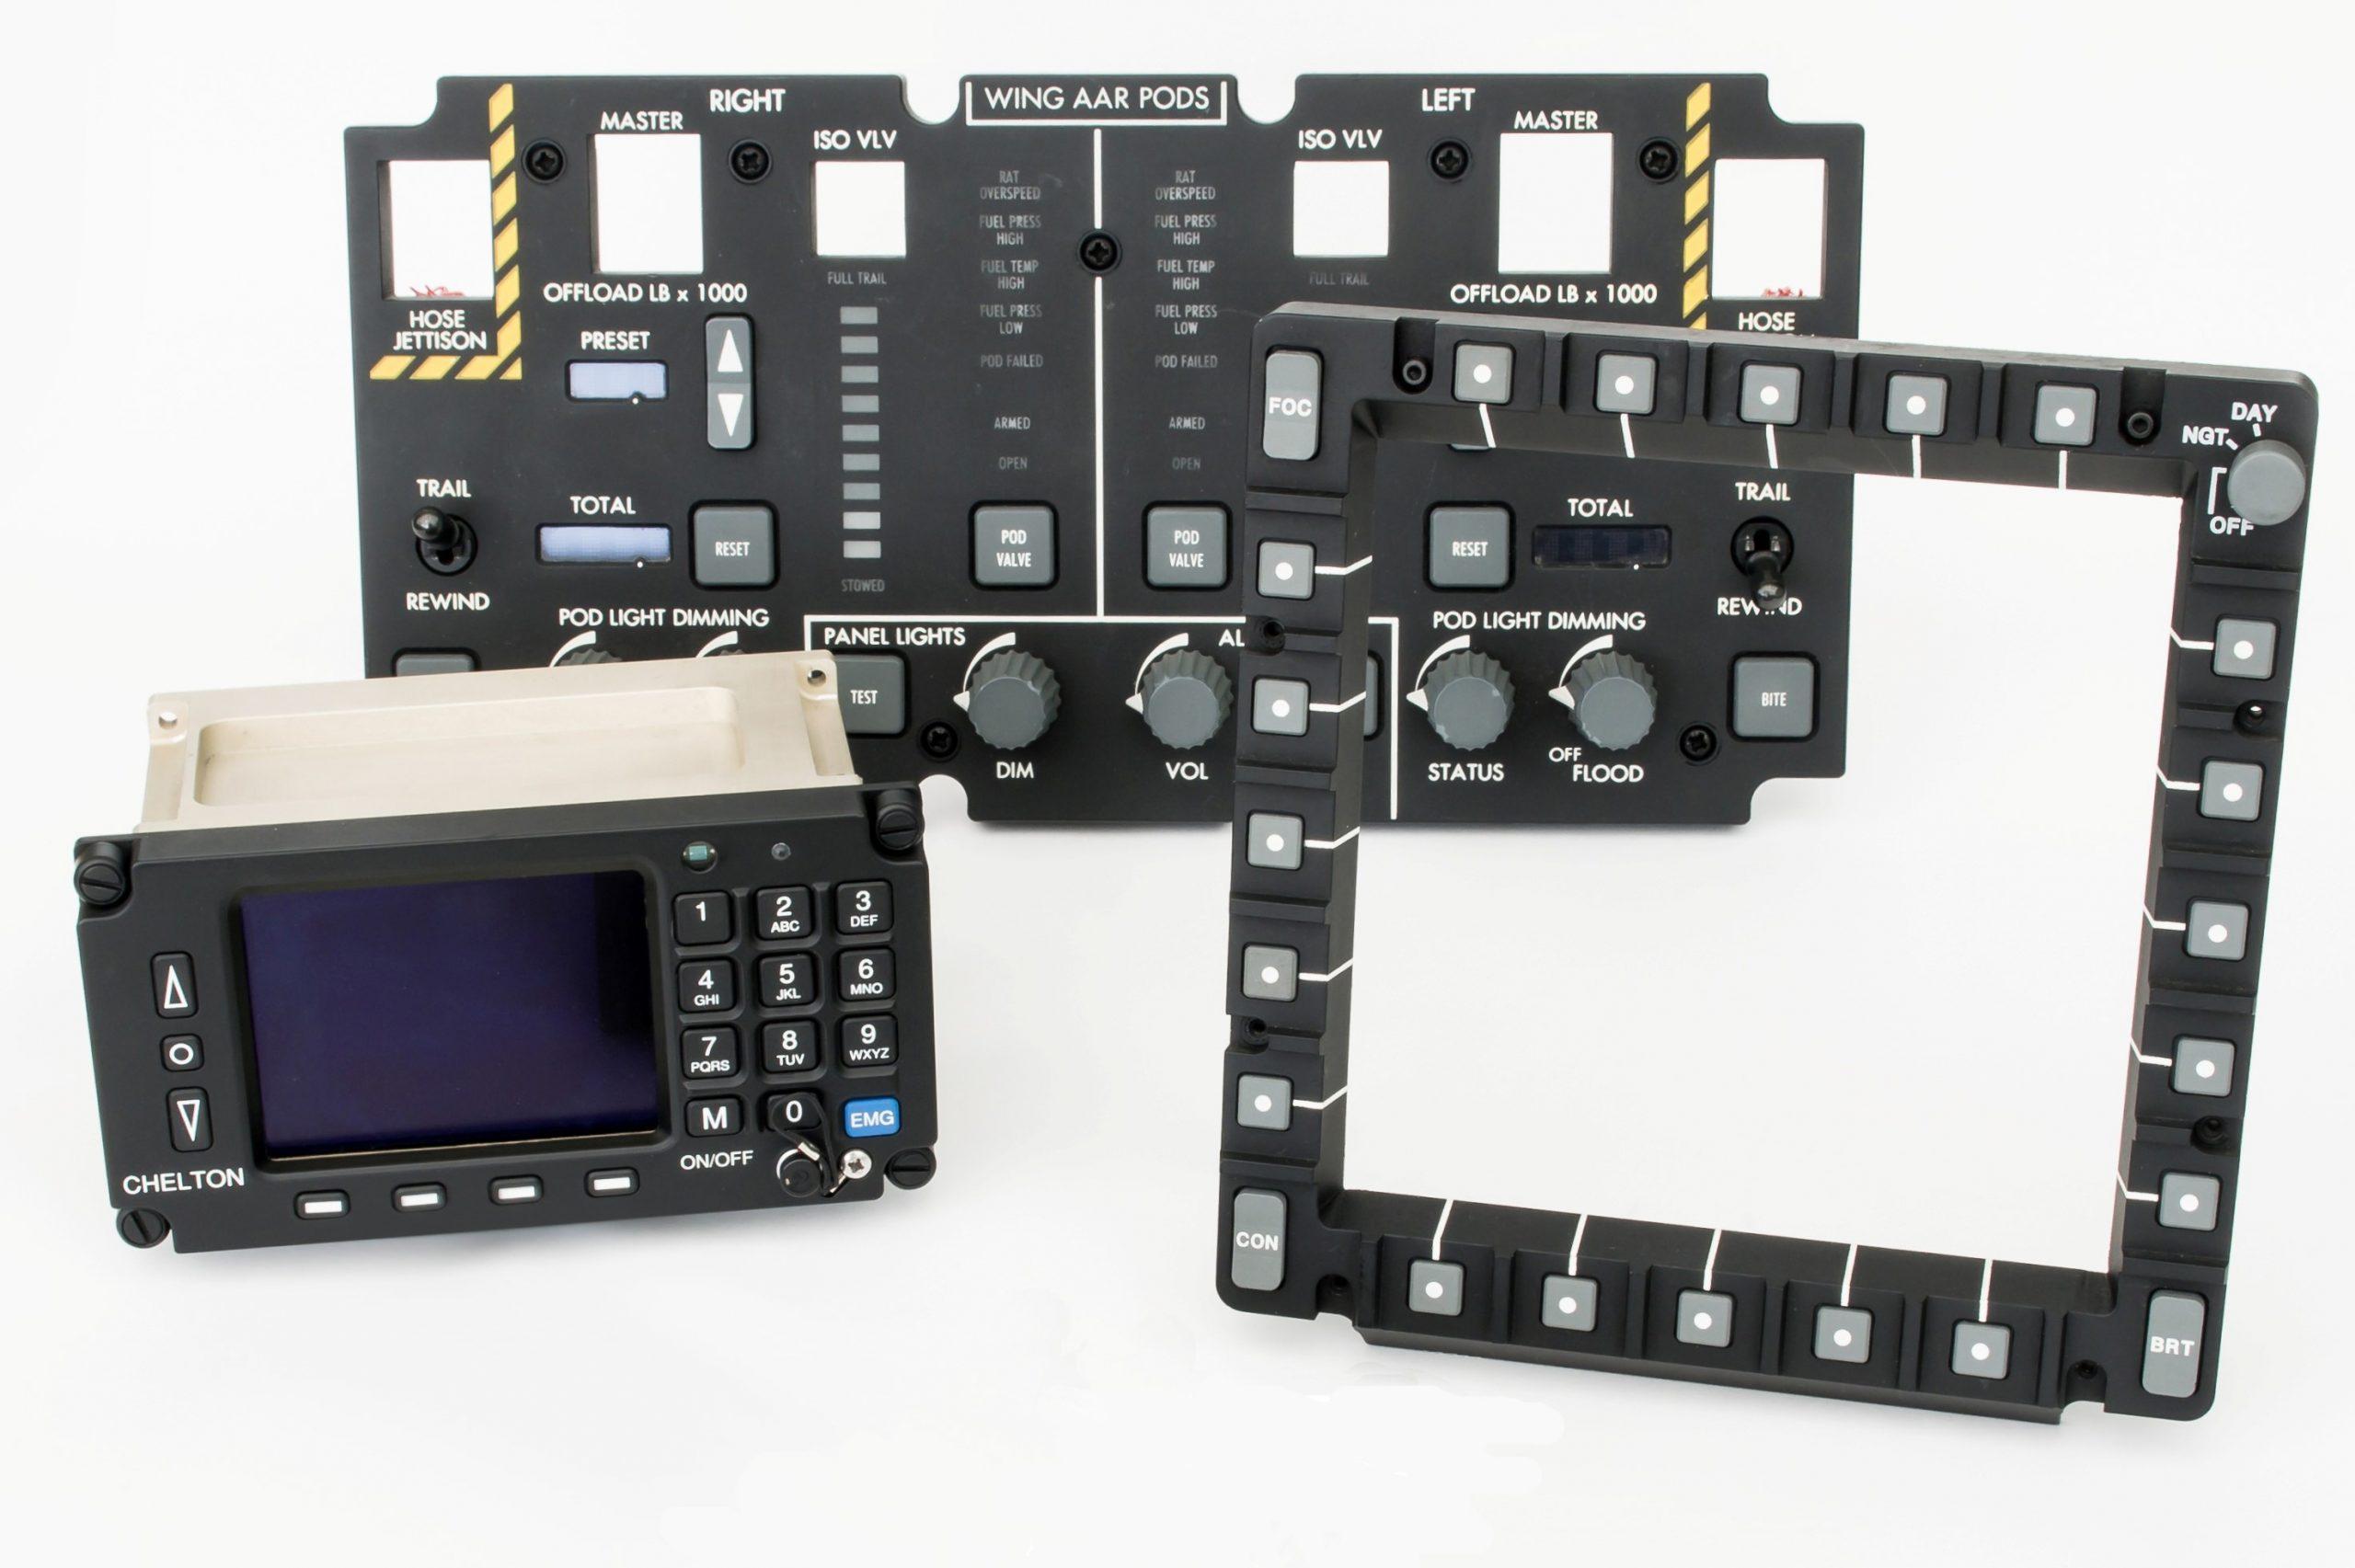 Illuminated control panels